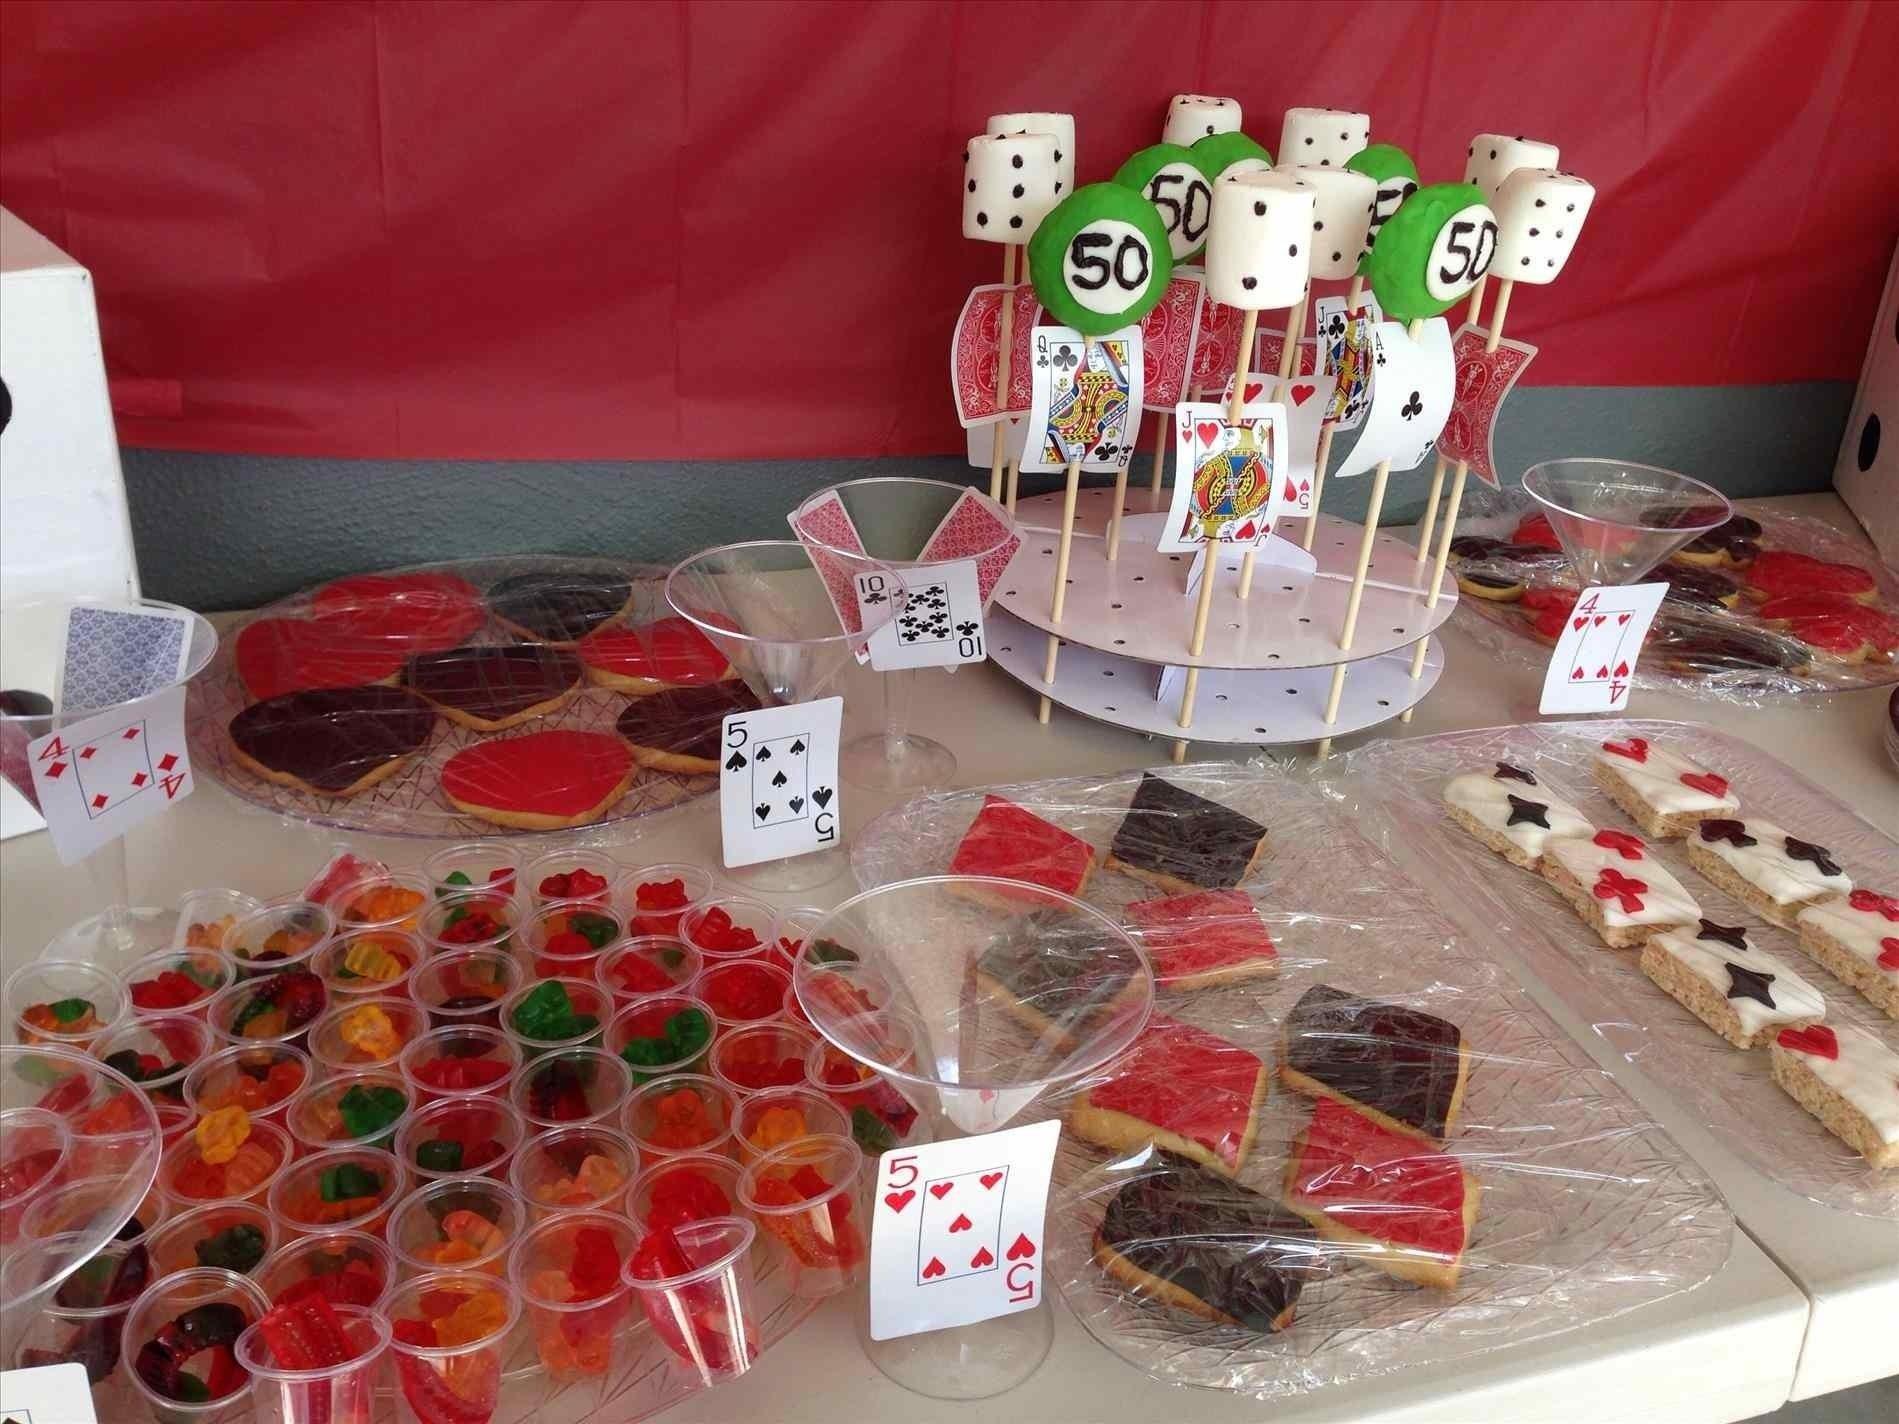 10 Attractive 50Th Birthday Party Ideas For Mom 50th birthday party themes for mom decoration perfect any milestone 2020